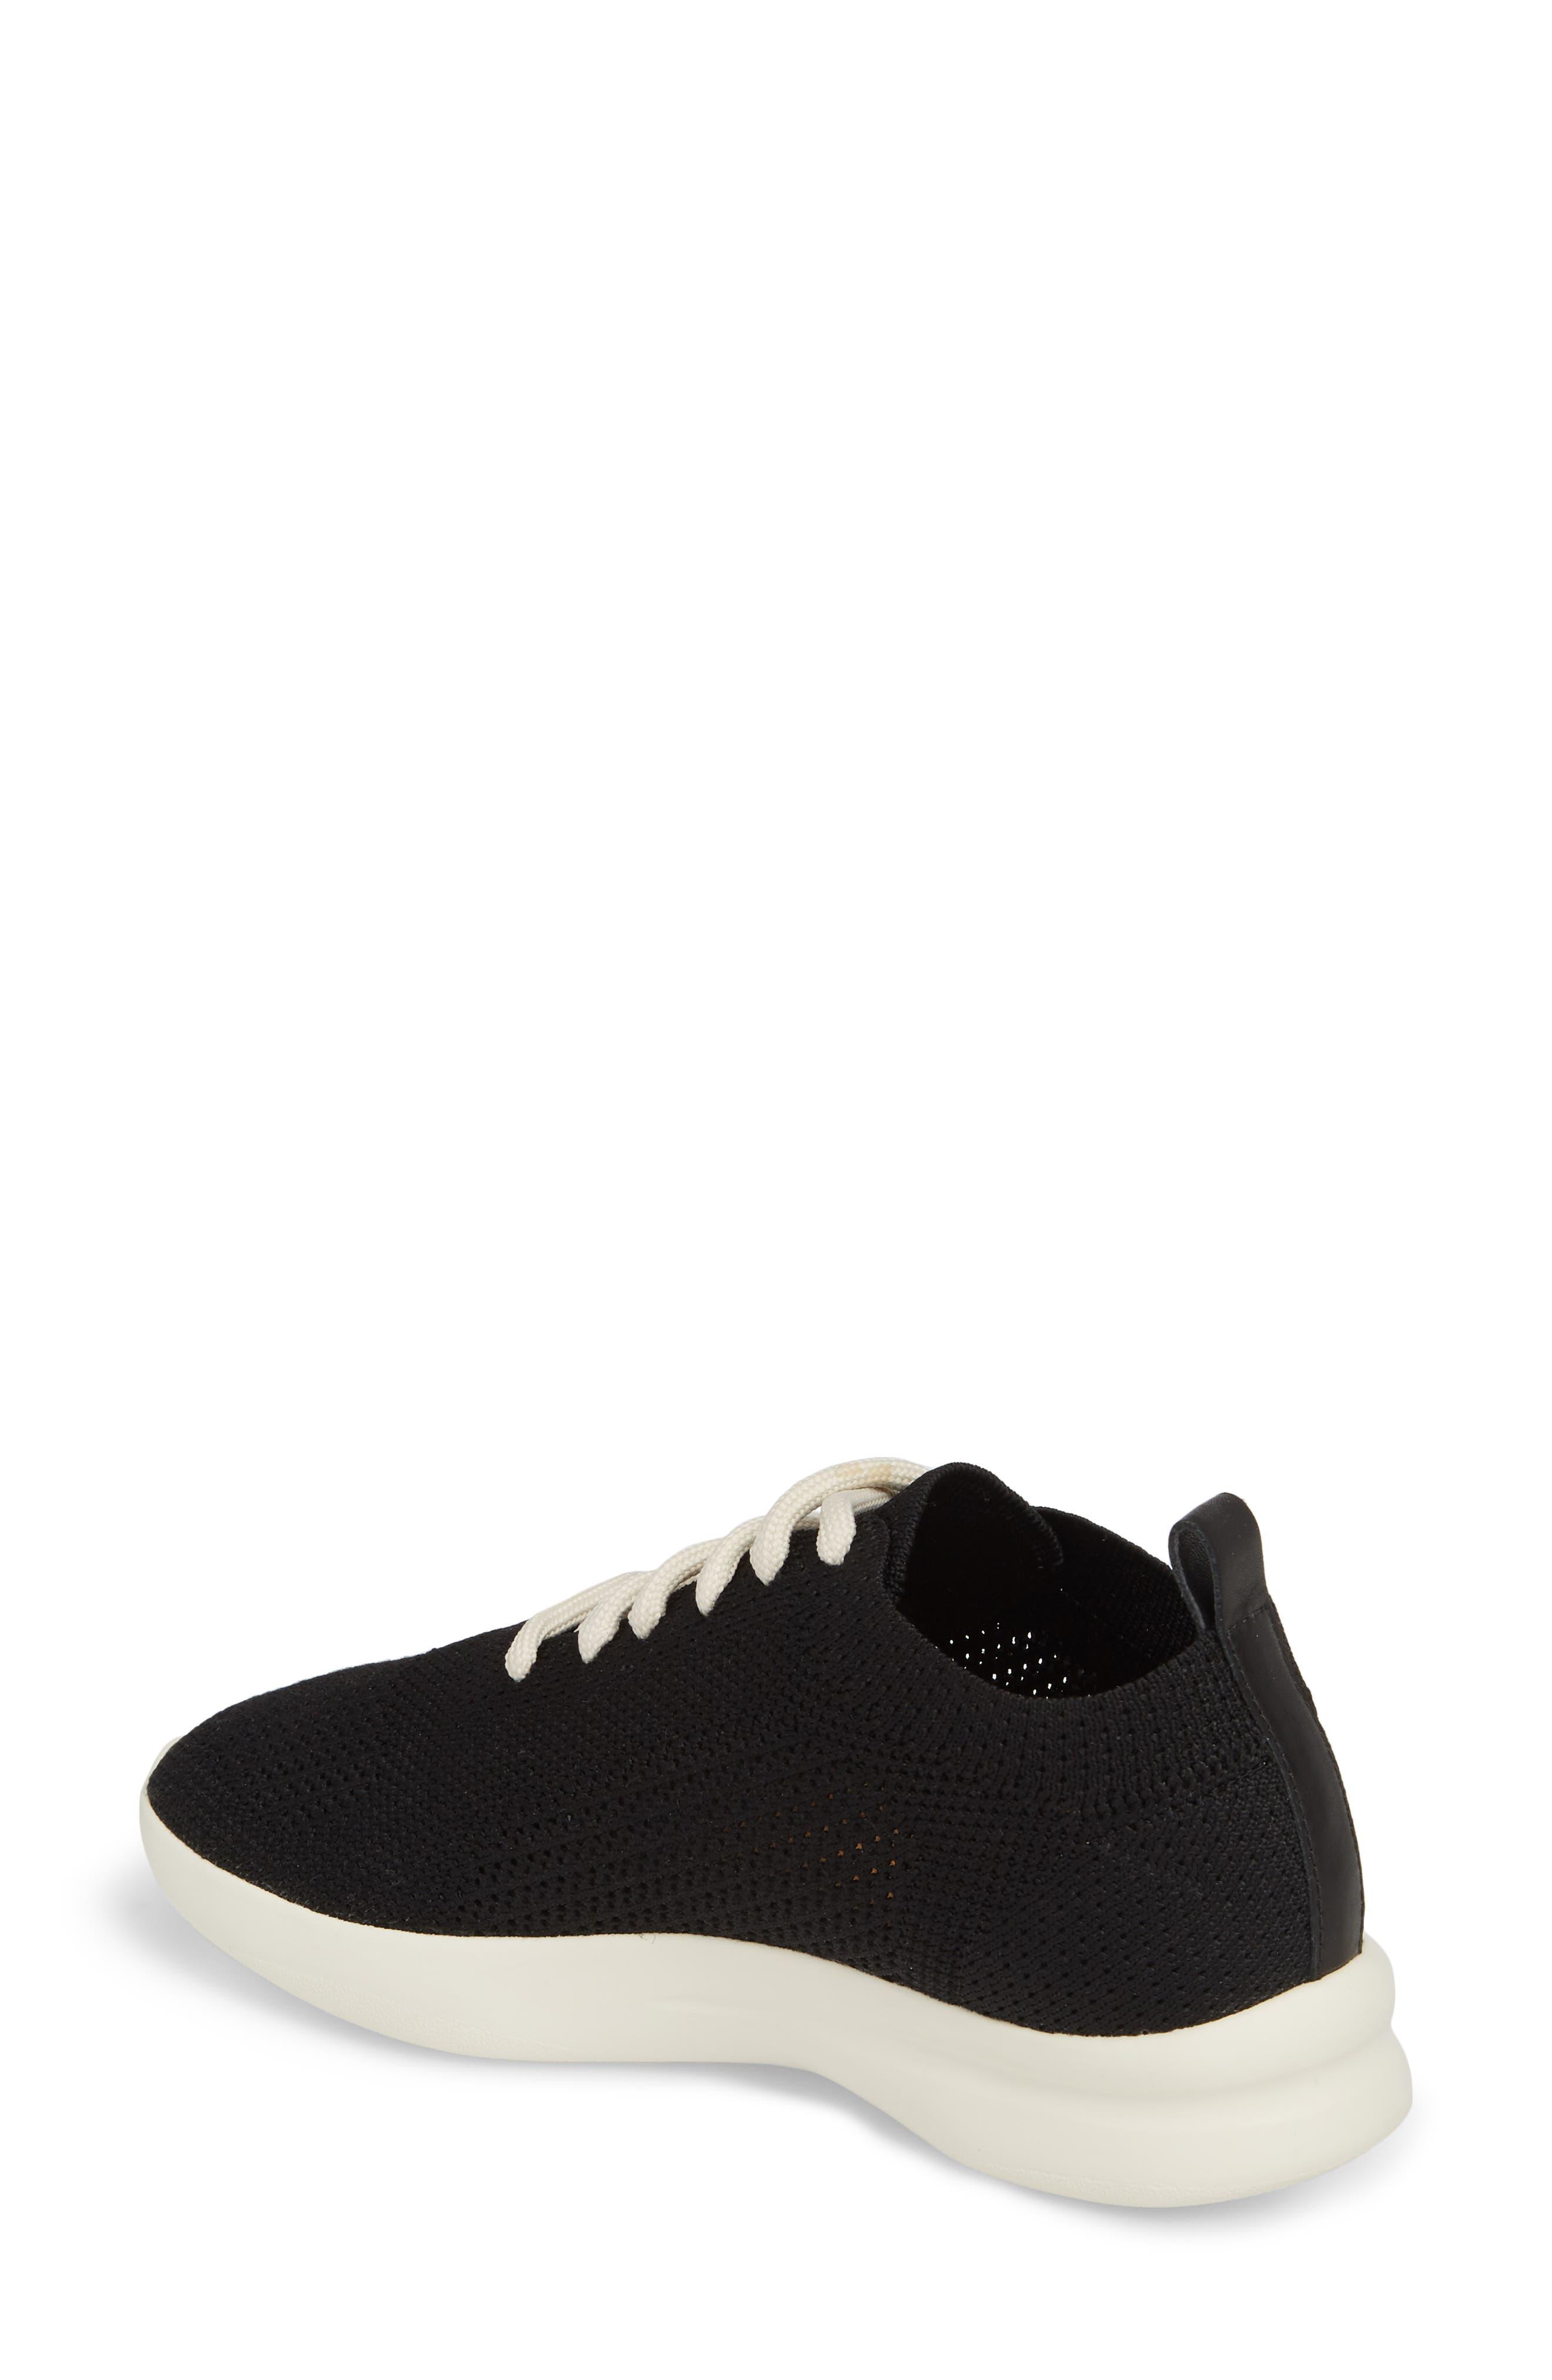 Randee Sneaker,                             Alternate thumbnail 7, color,